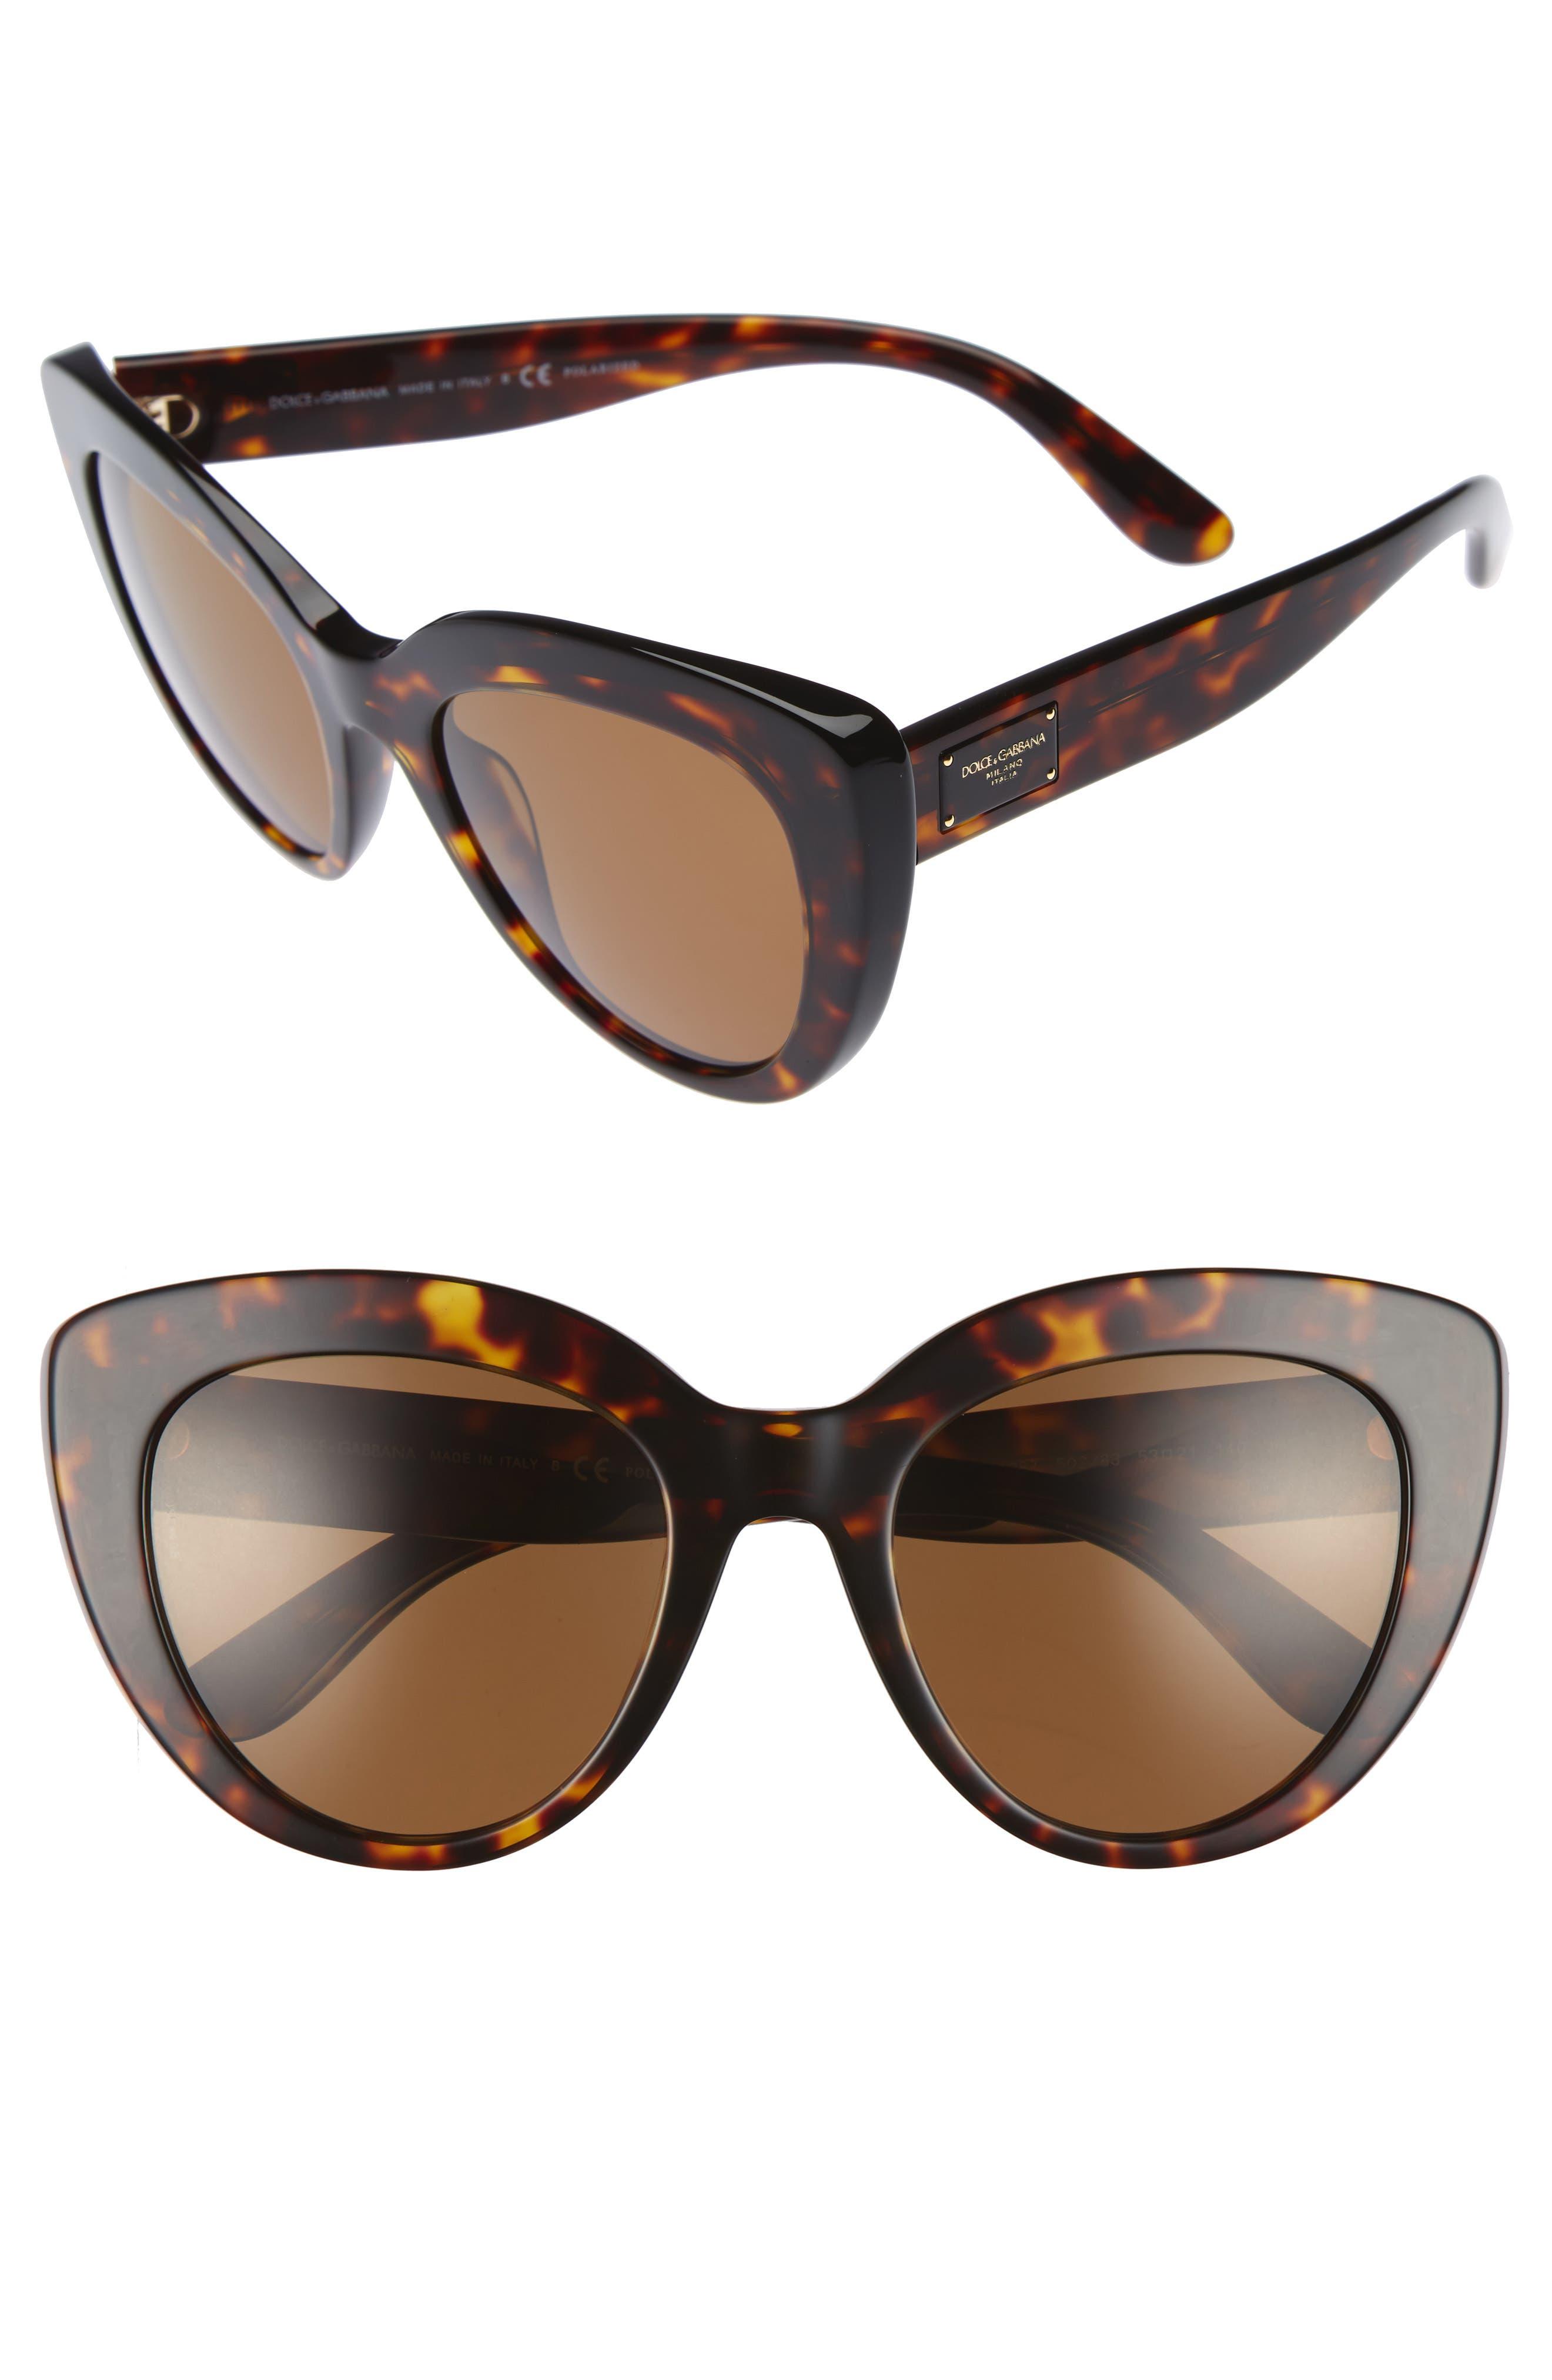 Dolce&Gabbana 53mm Polarized Cat Eye Sunglasses,                             Main thumbnail 1, color,                             200